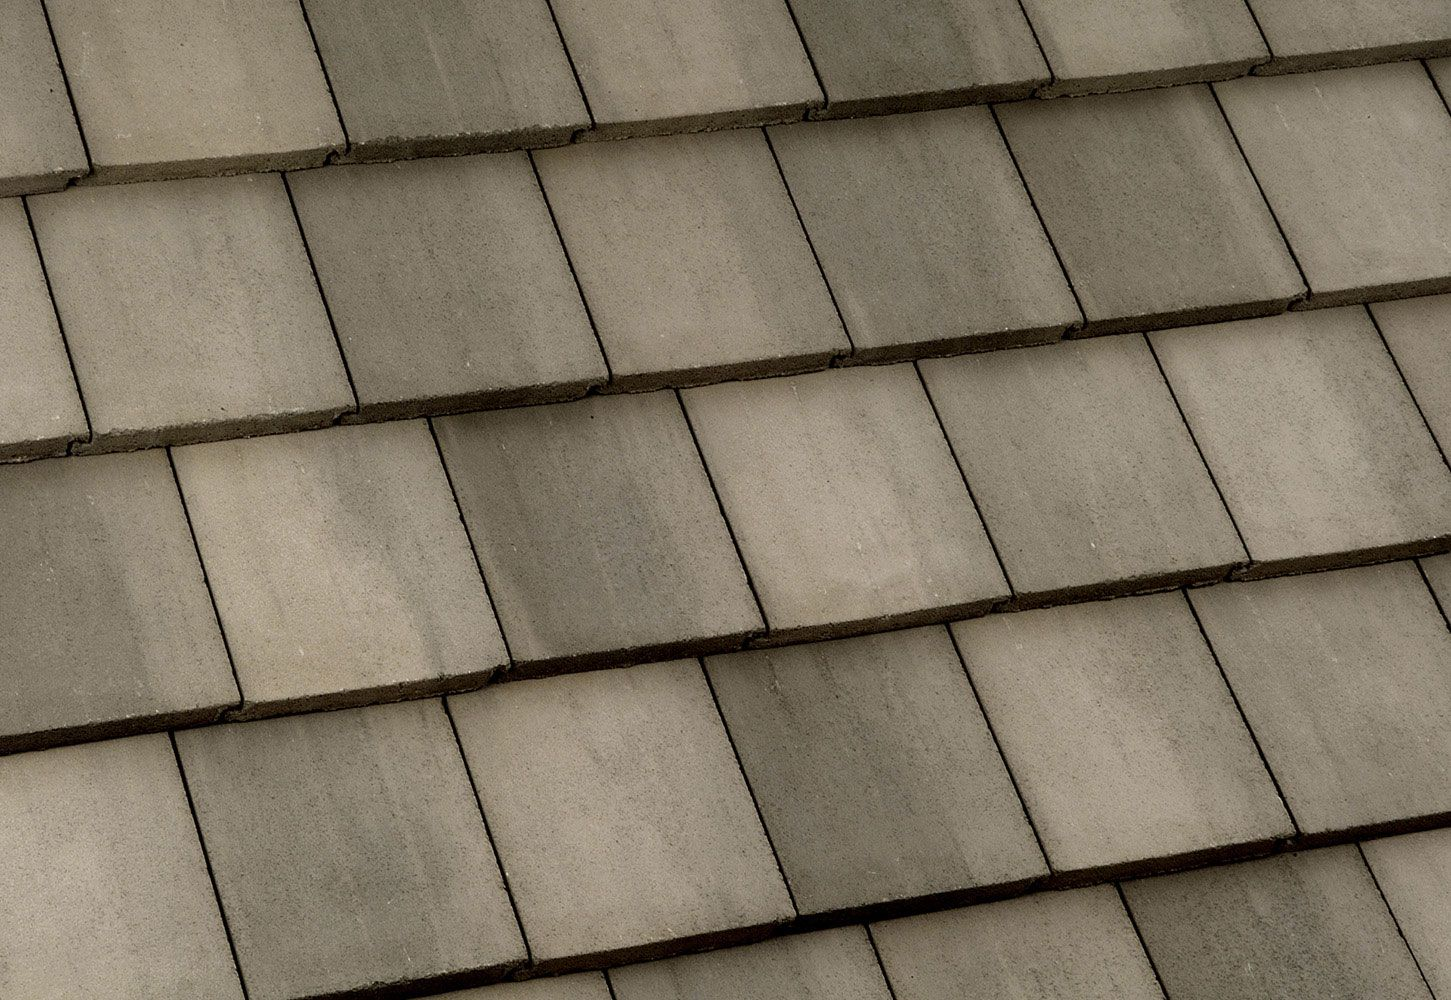 Brown Gray Range Concrete Roof Tiles Roofing Concrete Tiles